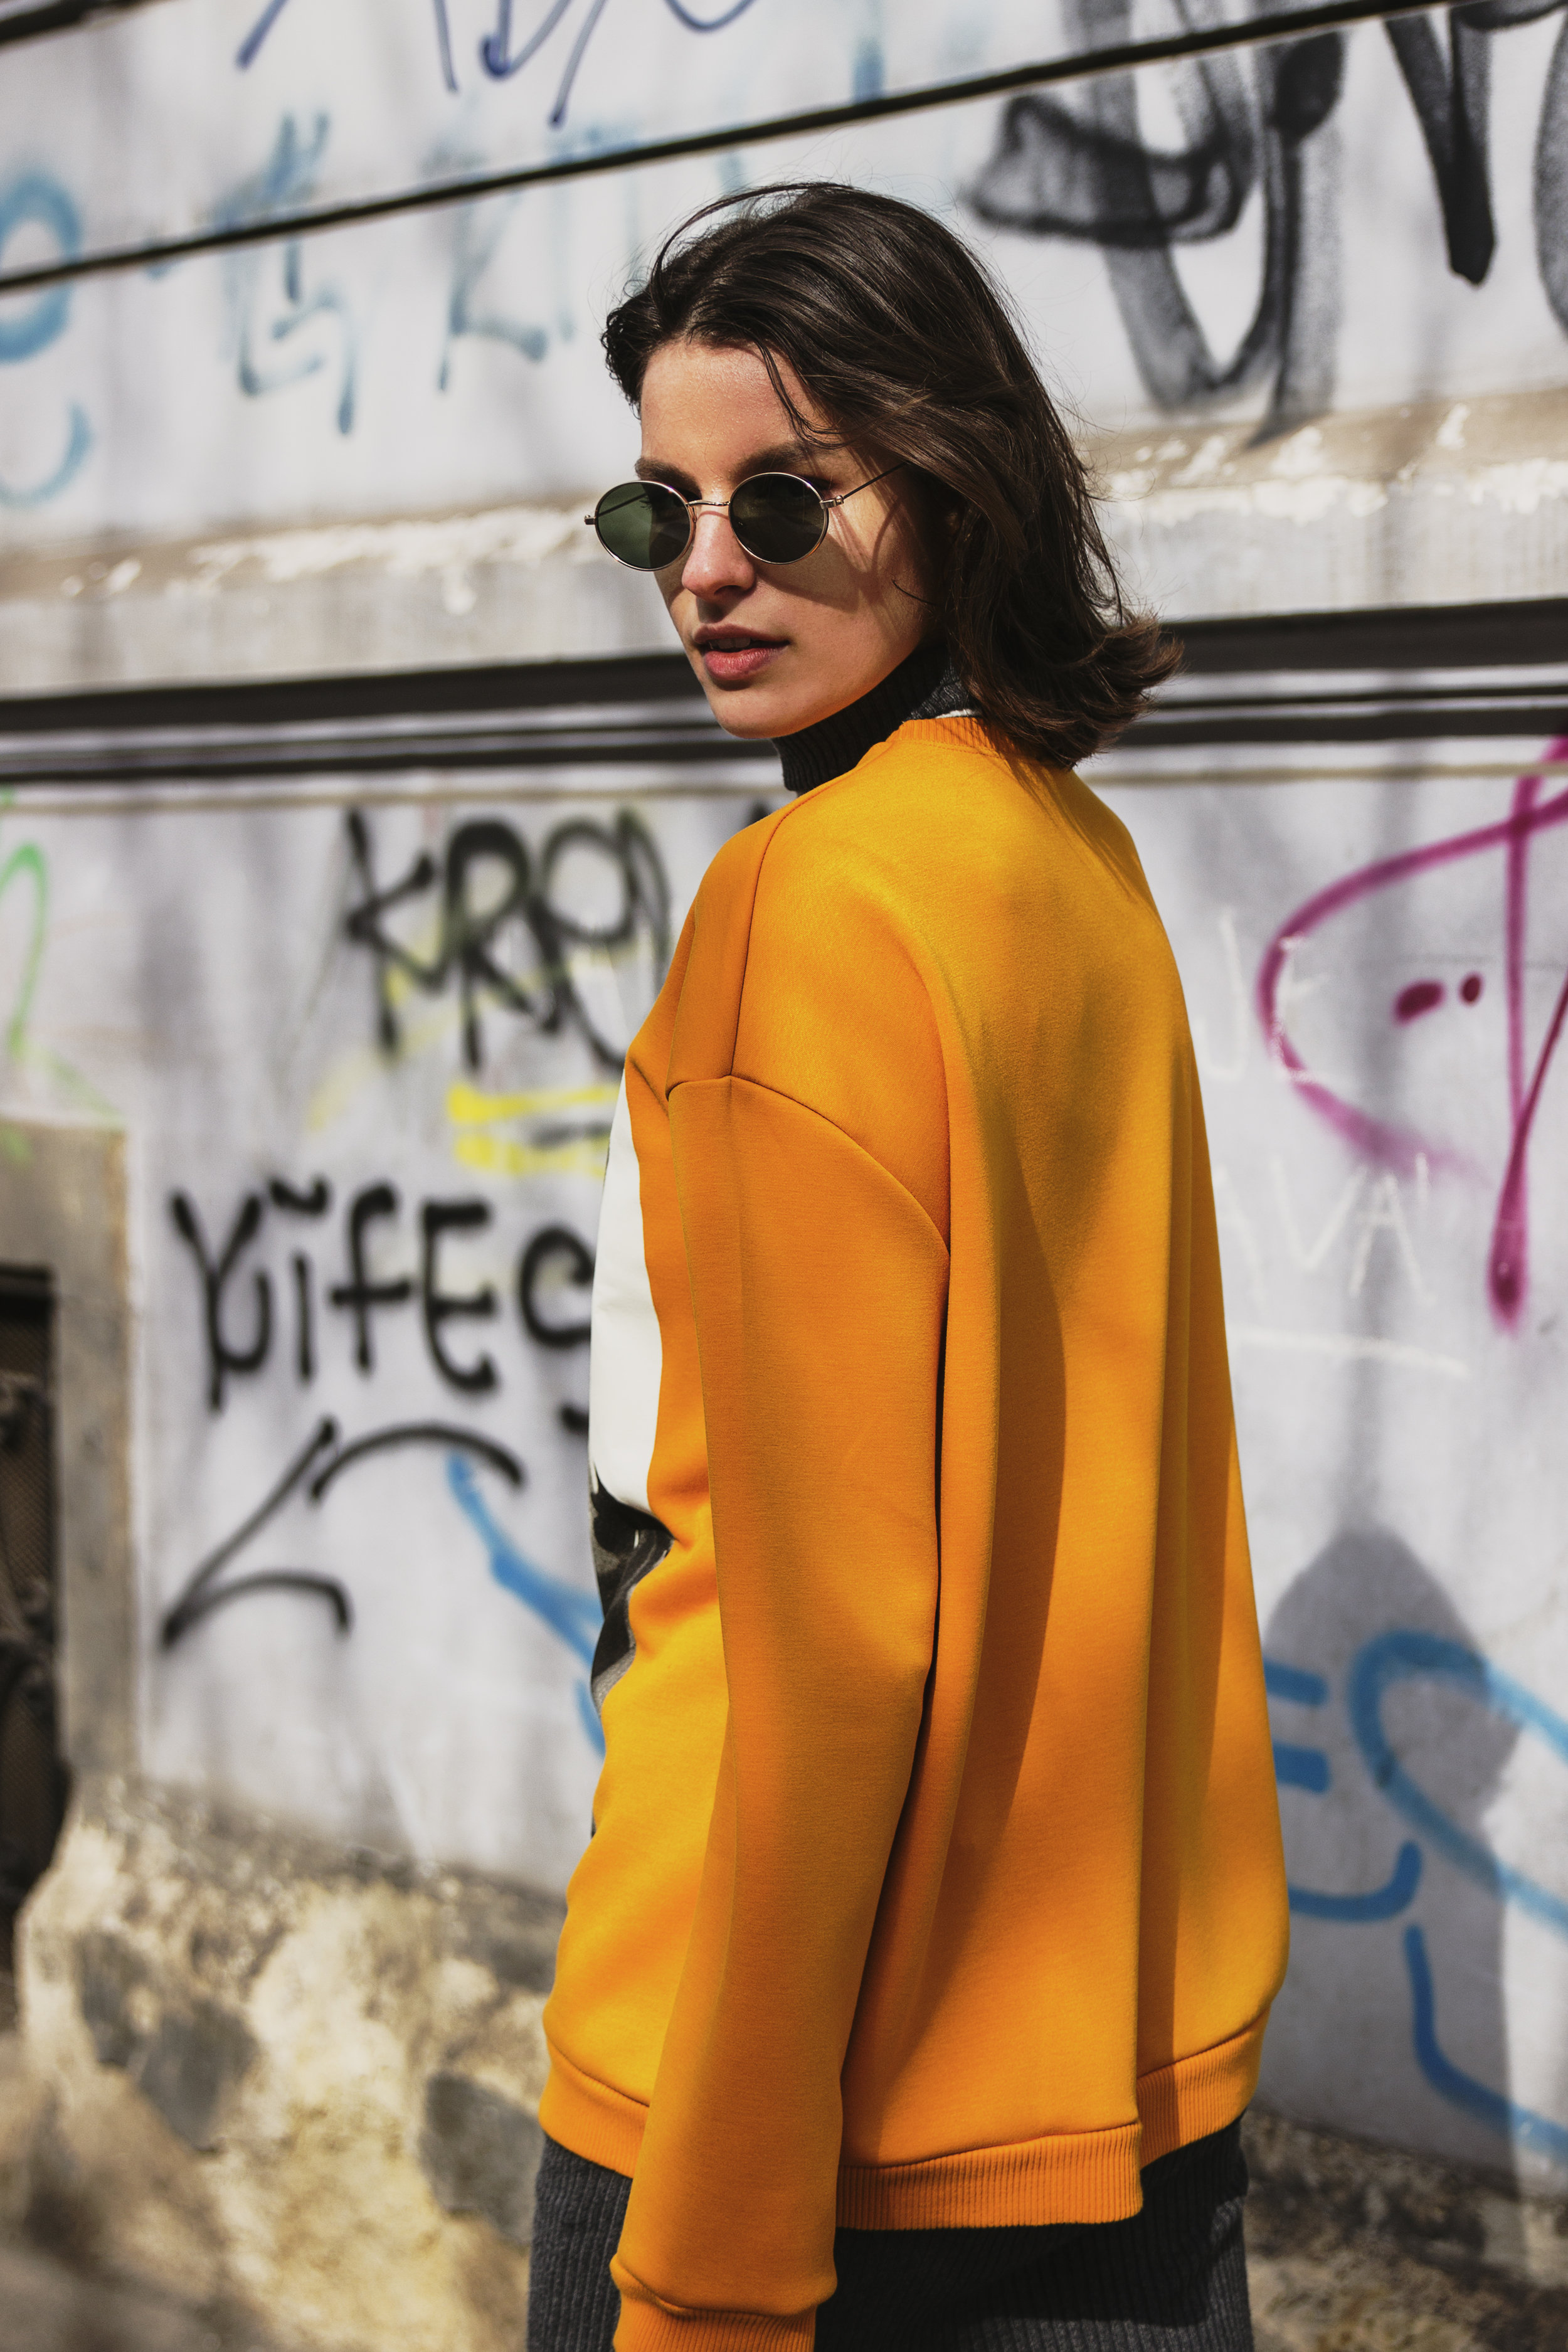 luka-lajic-fashion-photography-zagreb-croatia (6).jpg